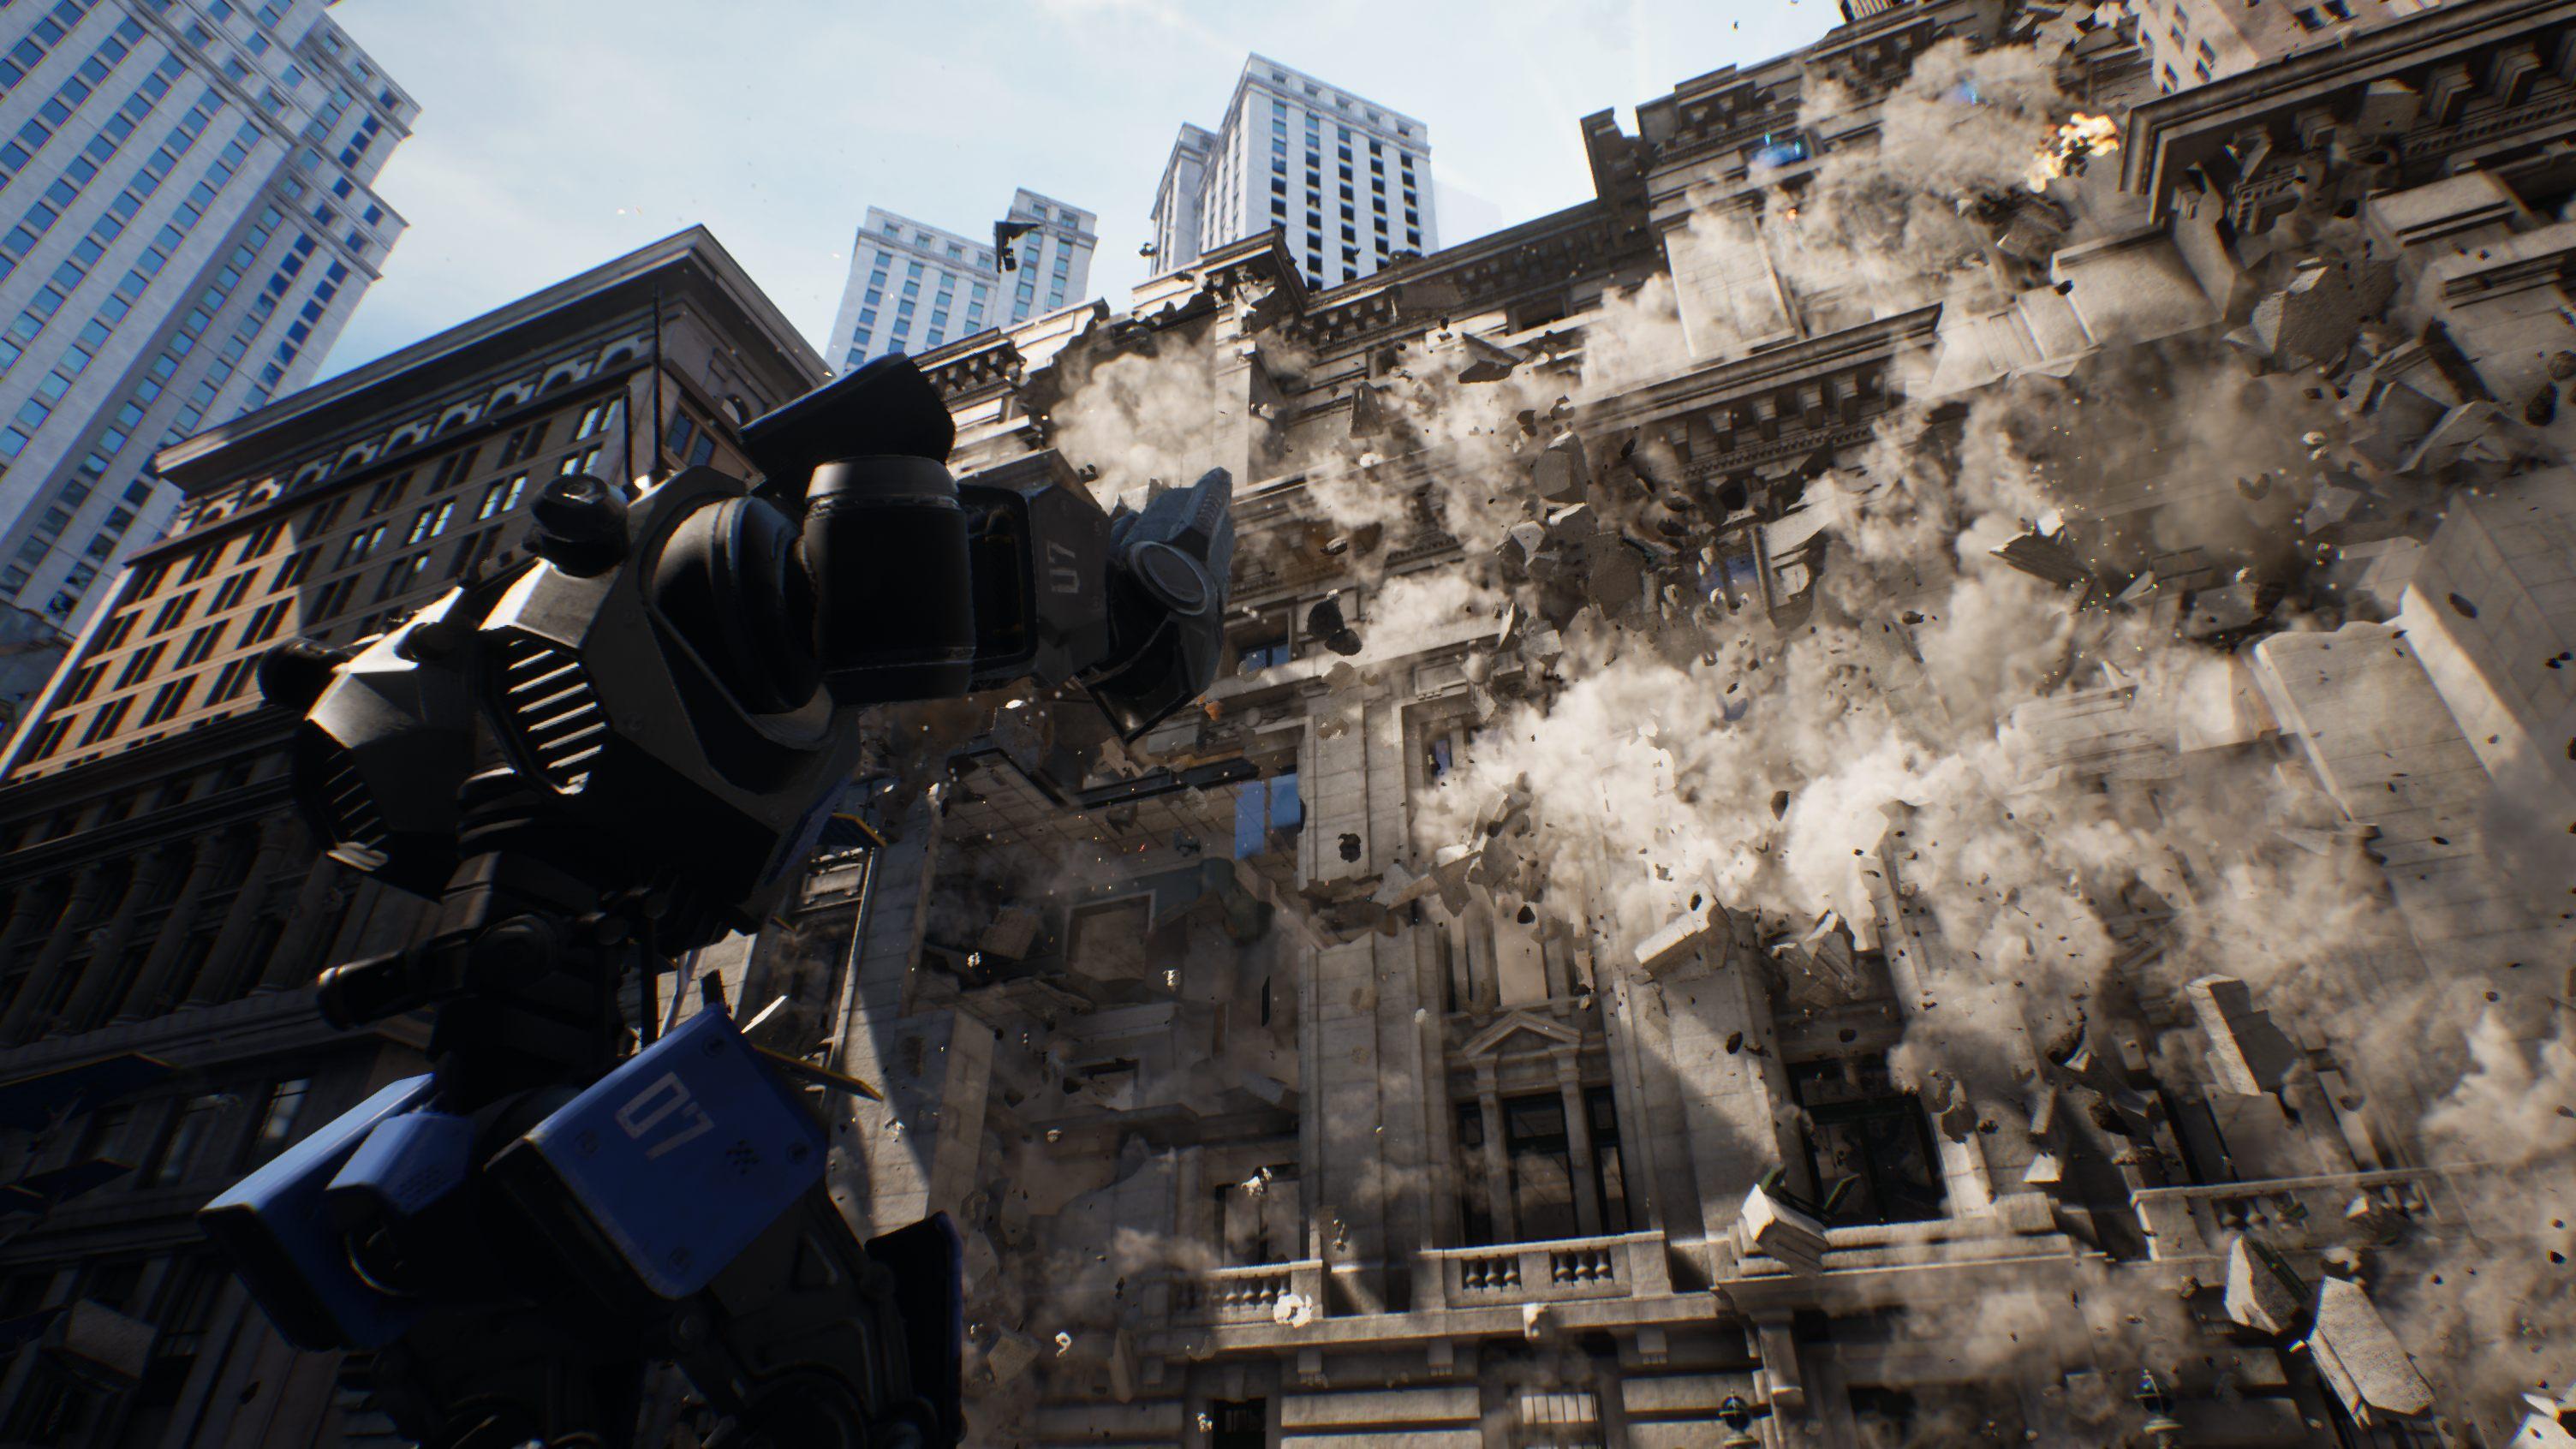 Unreal Engine Chaos system physics destruction destructive environment Robo Recall screenshot